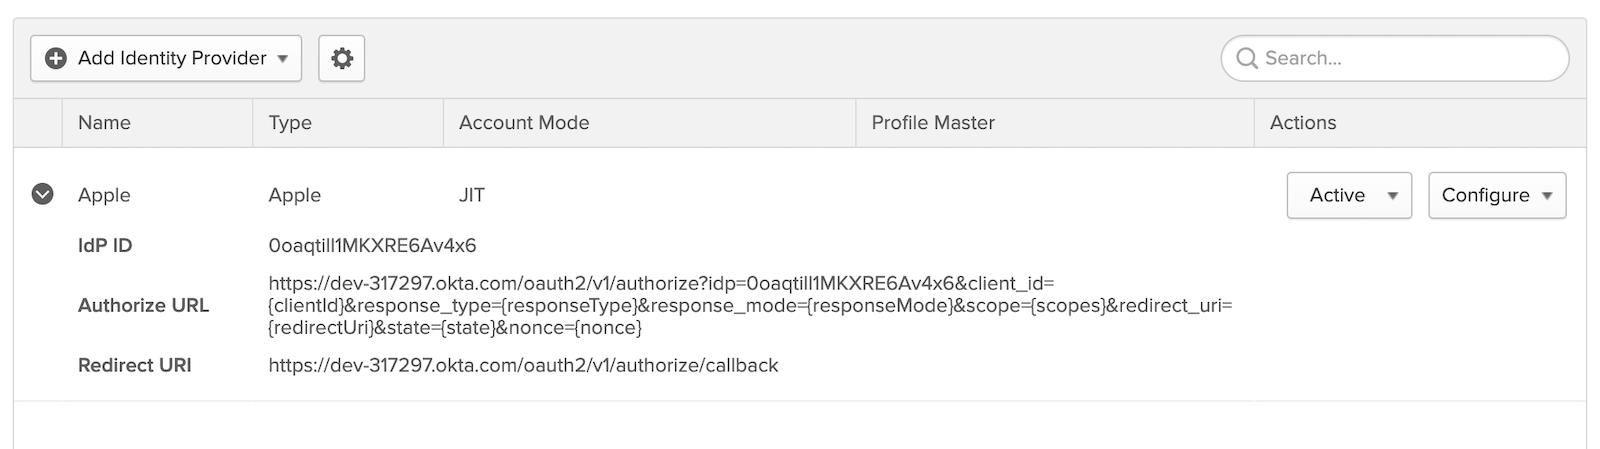 Apple Identity Provider